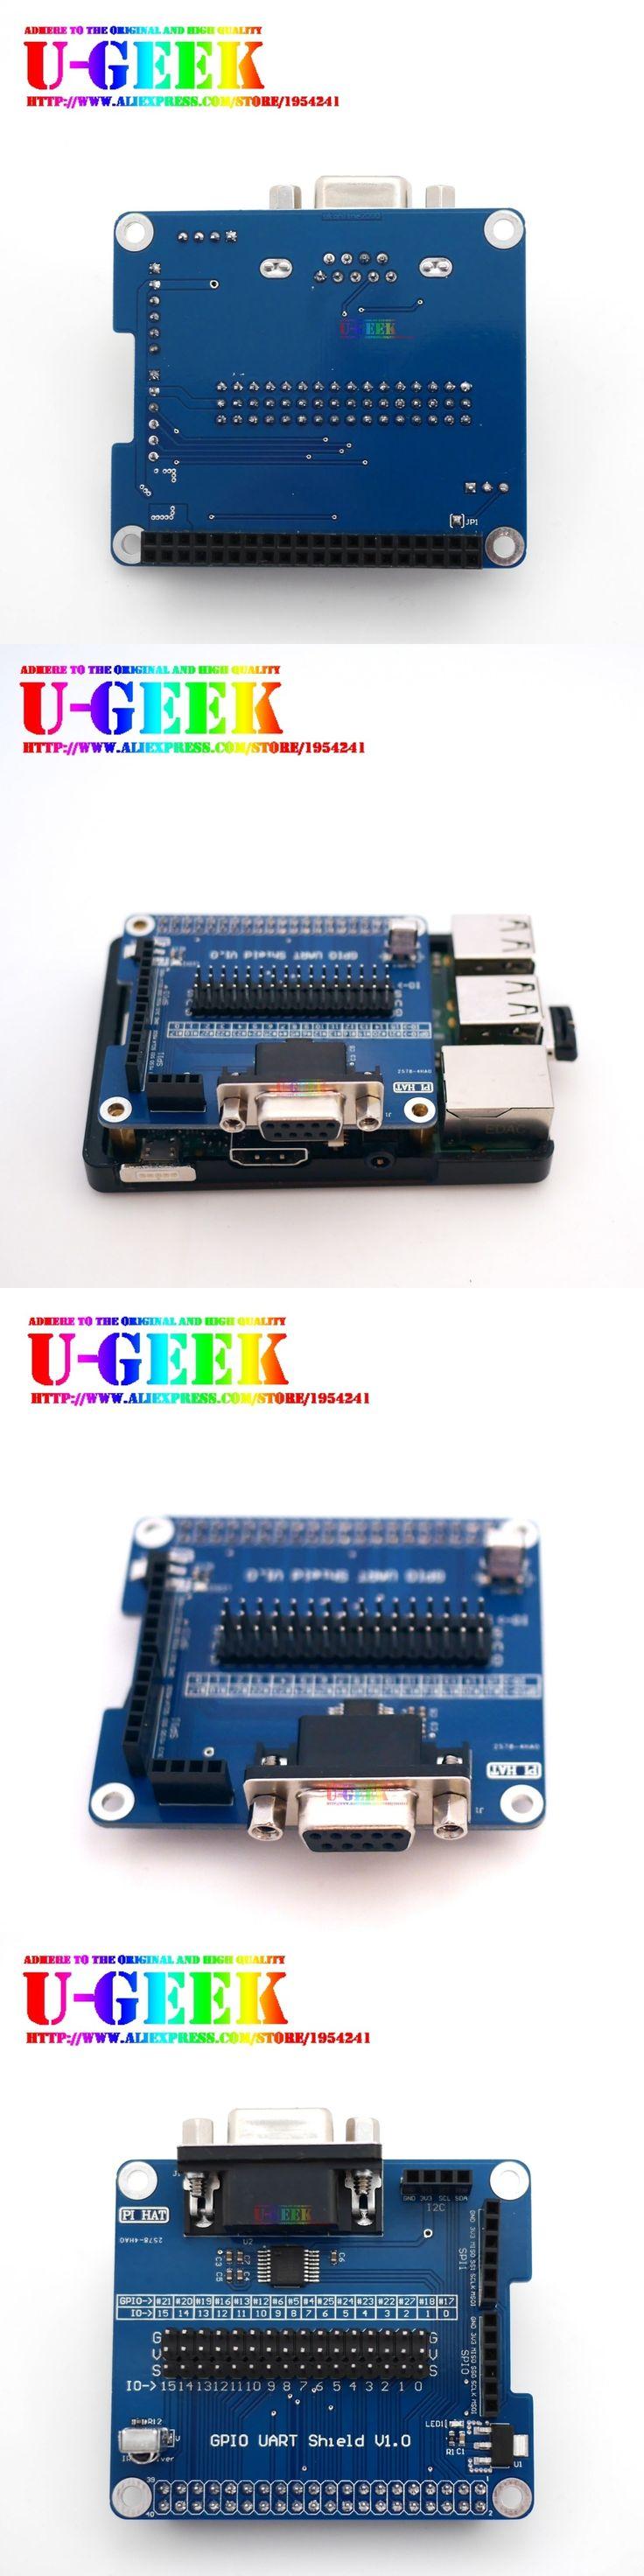 UGEEK Original Design! Serial Port Expansion Board RS232 for Raspberry Pi 3 Model B, 2 B, B+ GPIO UART Shield | With IR receive